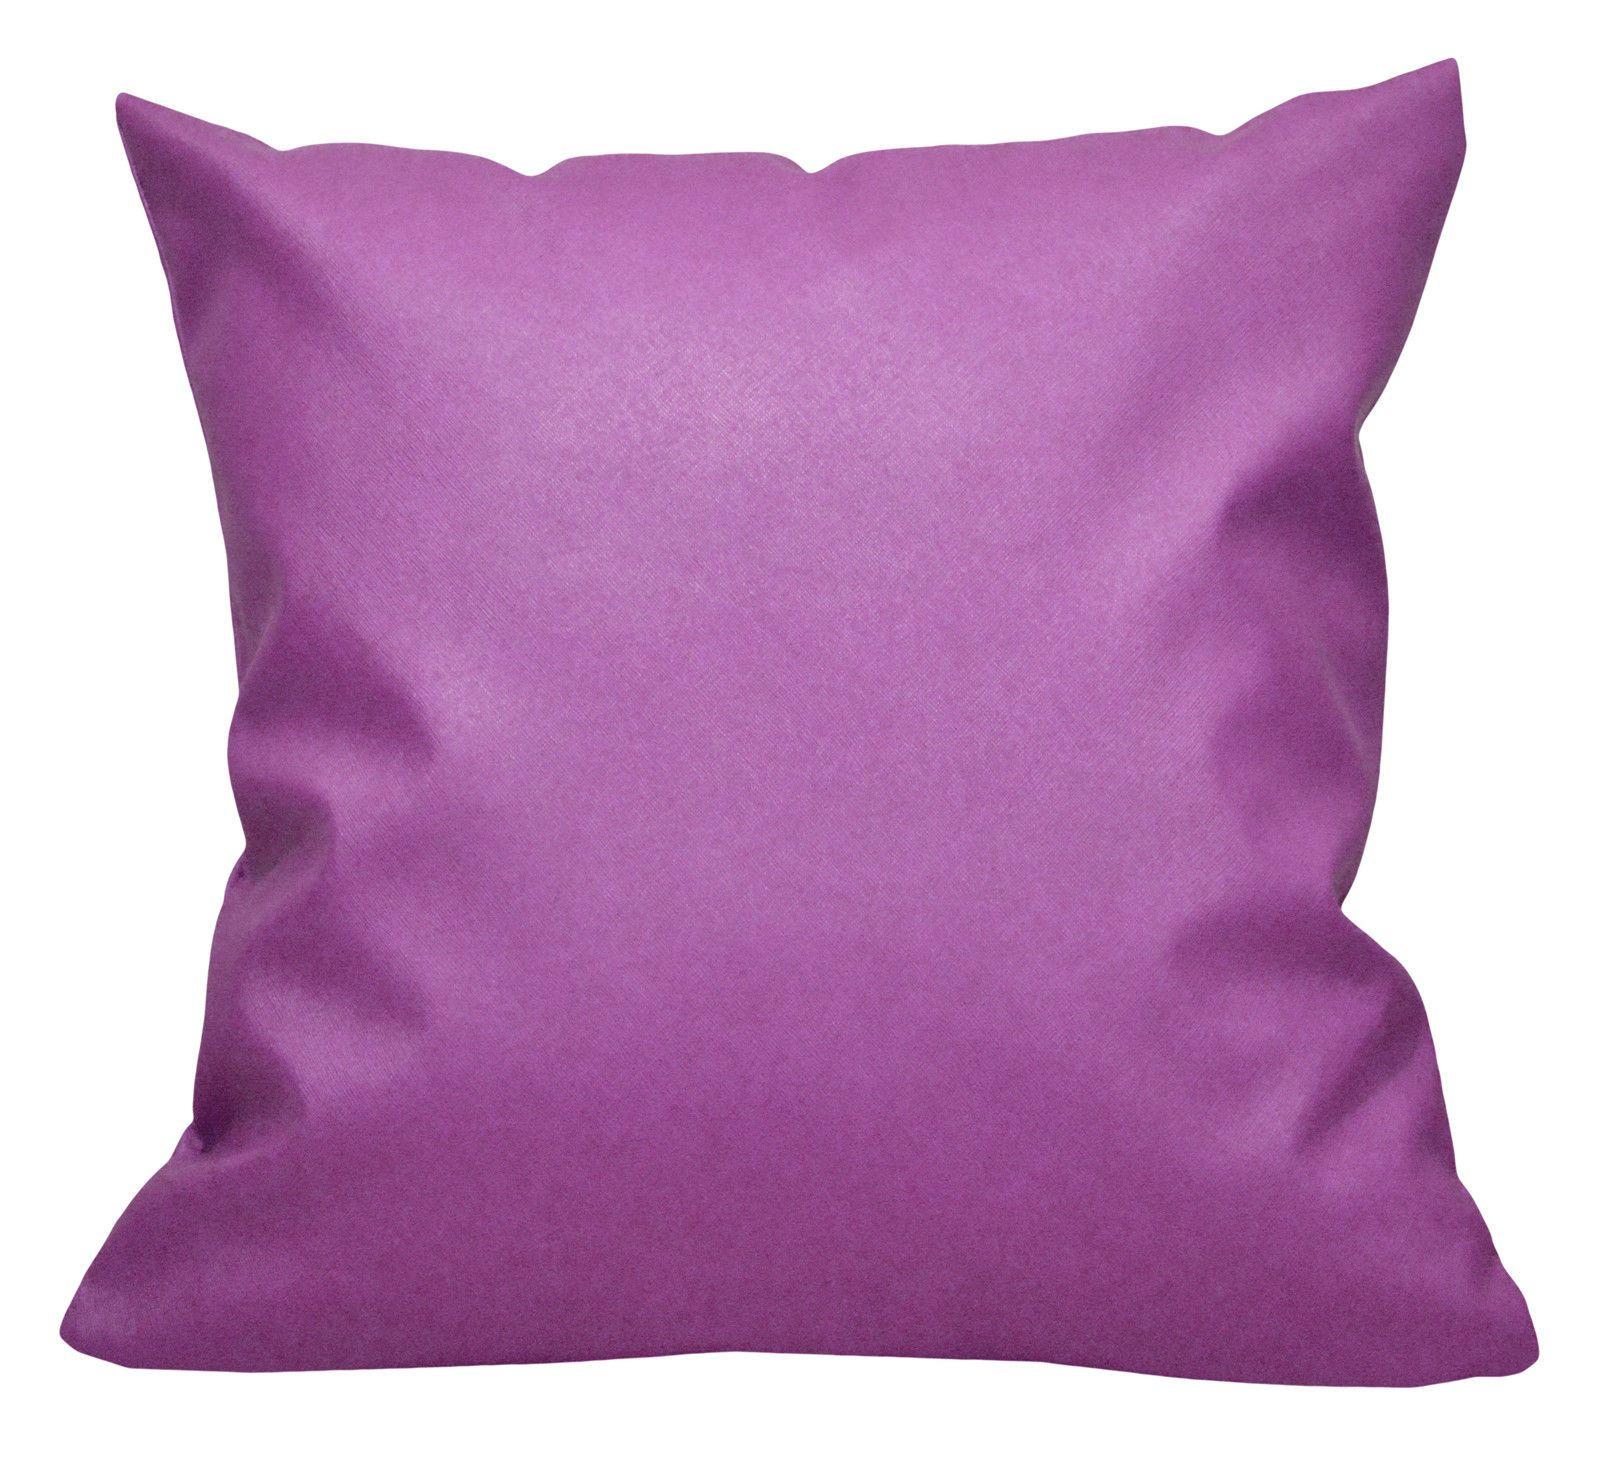 Pca purple faux leather cross pattern pvc cushion coverpillow